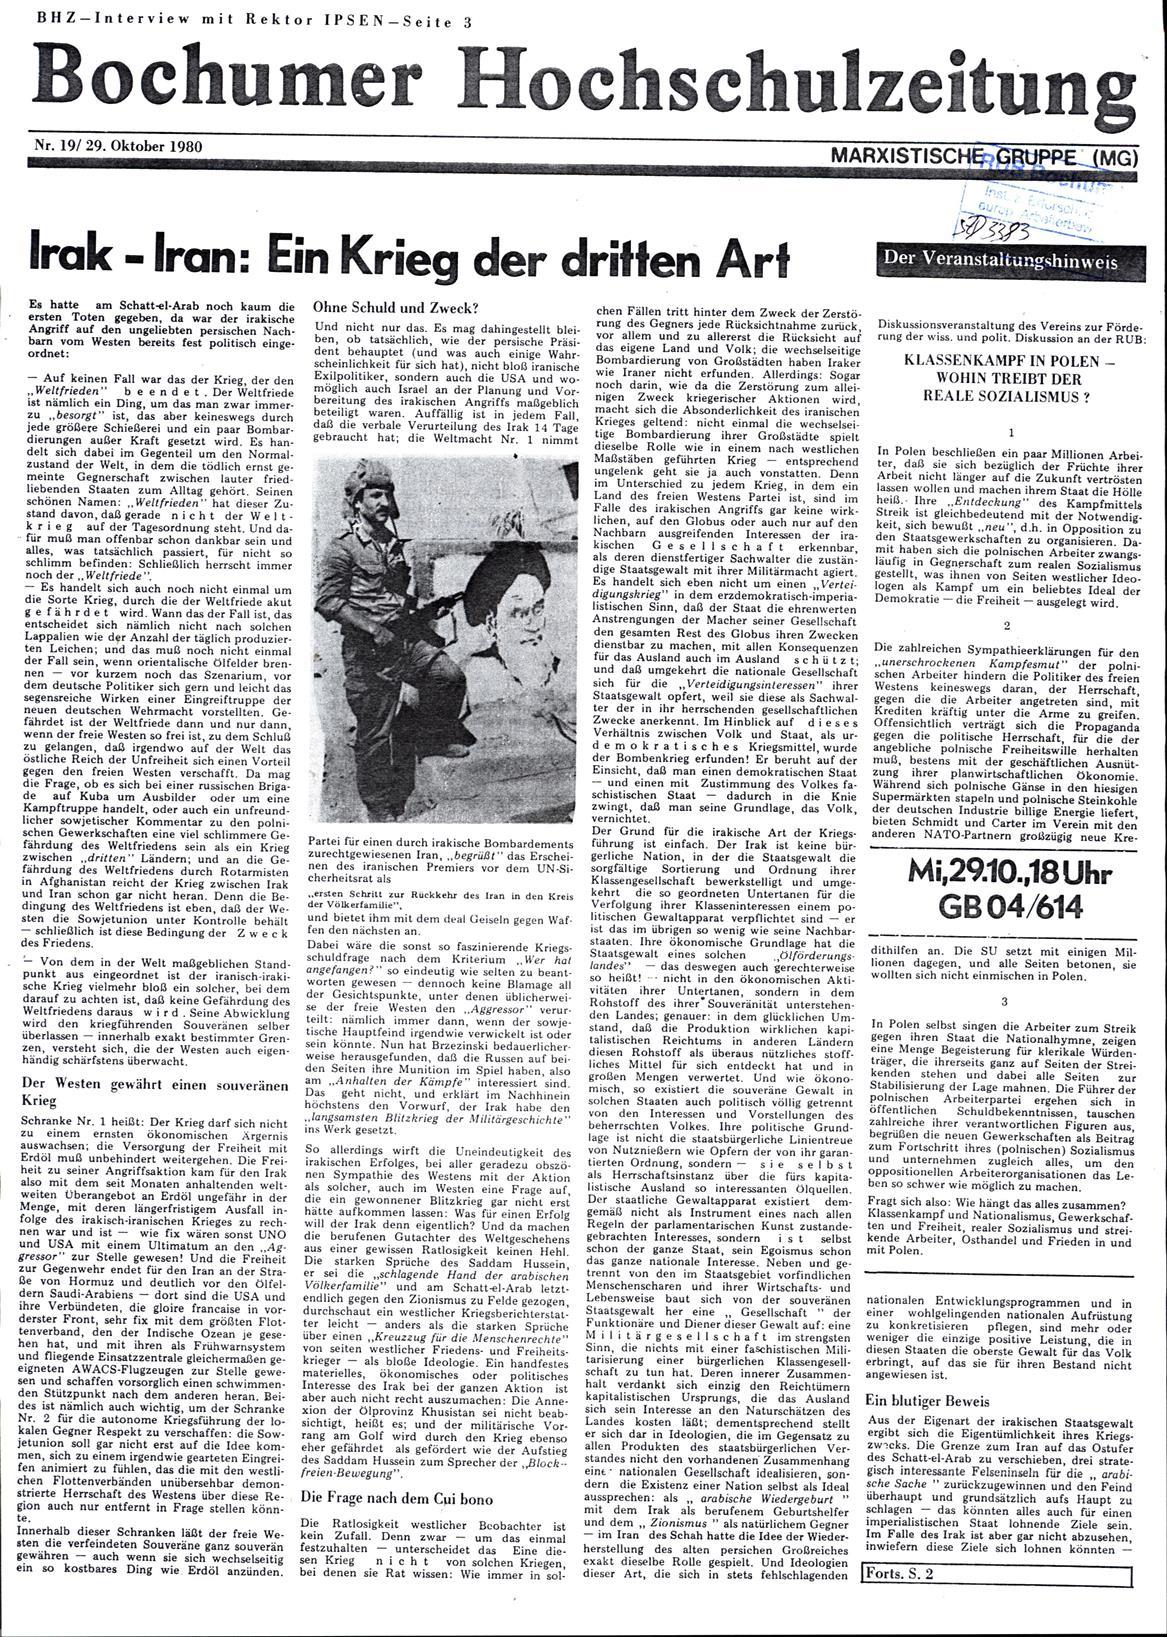 Bochum_BHZ_19801029_019_001